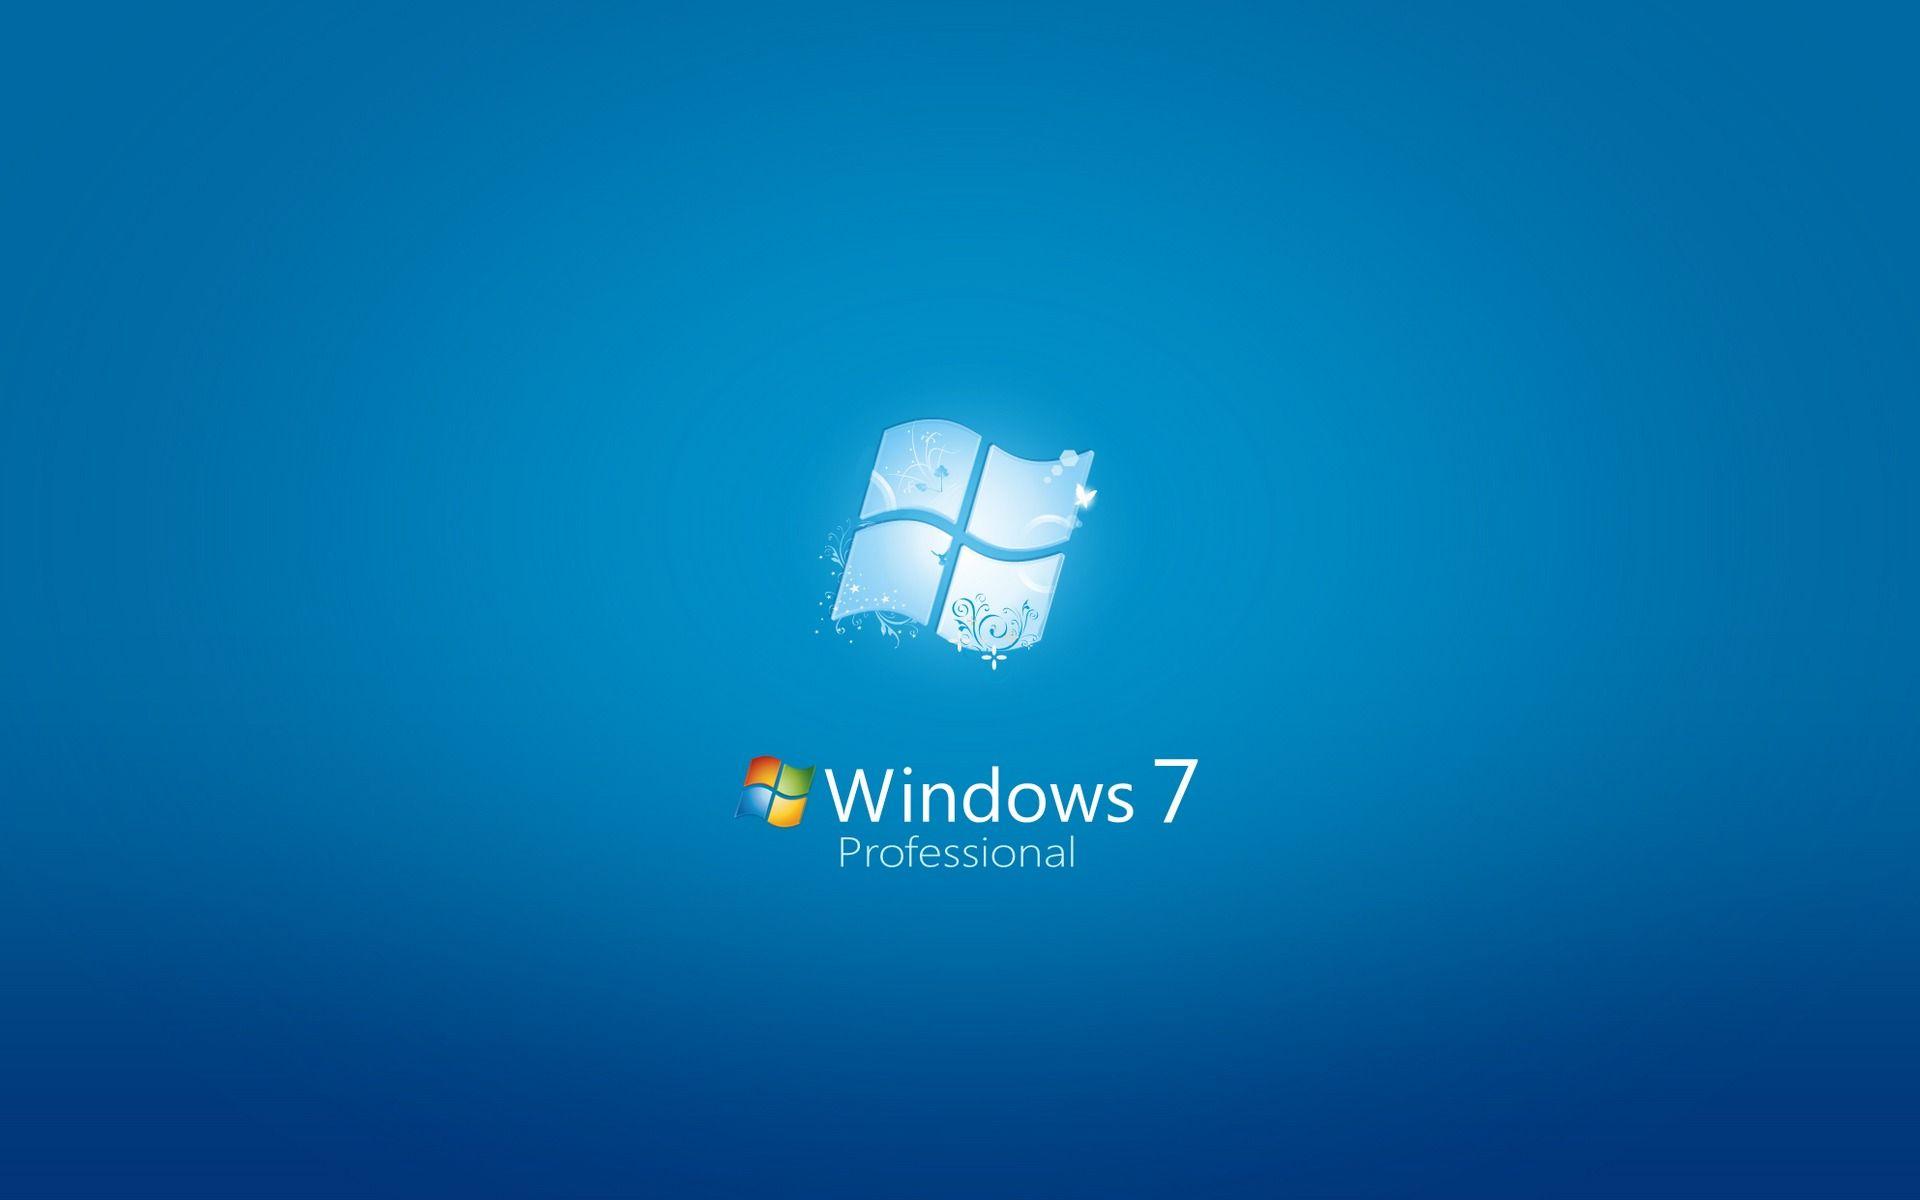 Windows 7 Professional Desktop Wallpapers   Top Windows 7 1920x1200